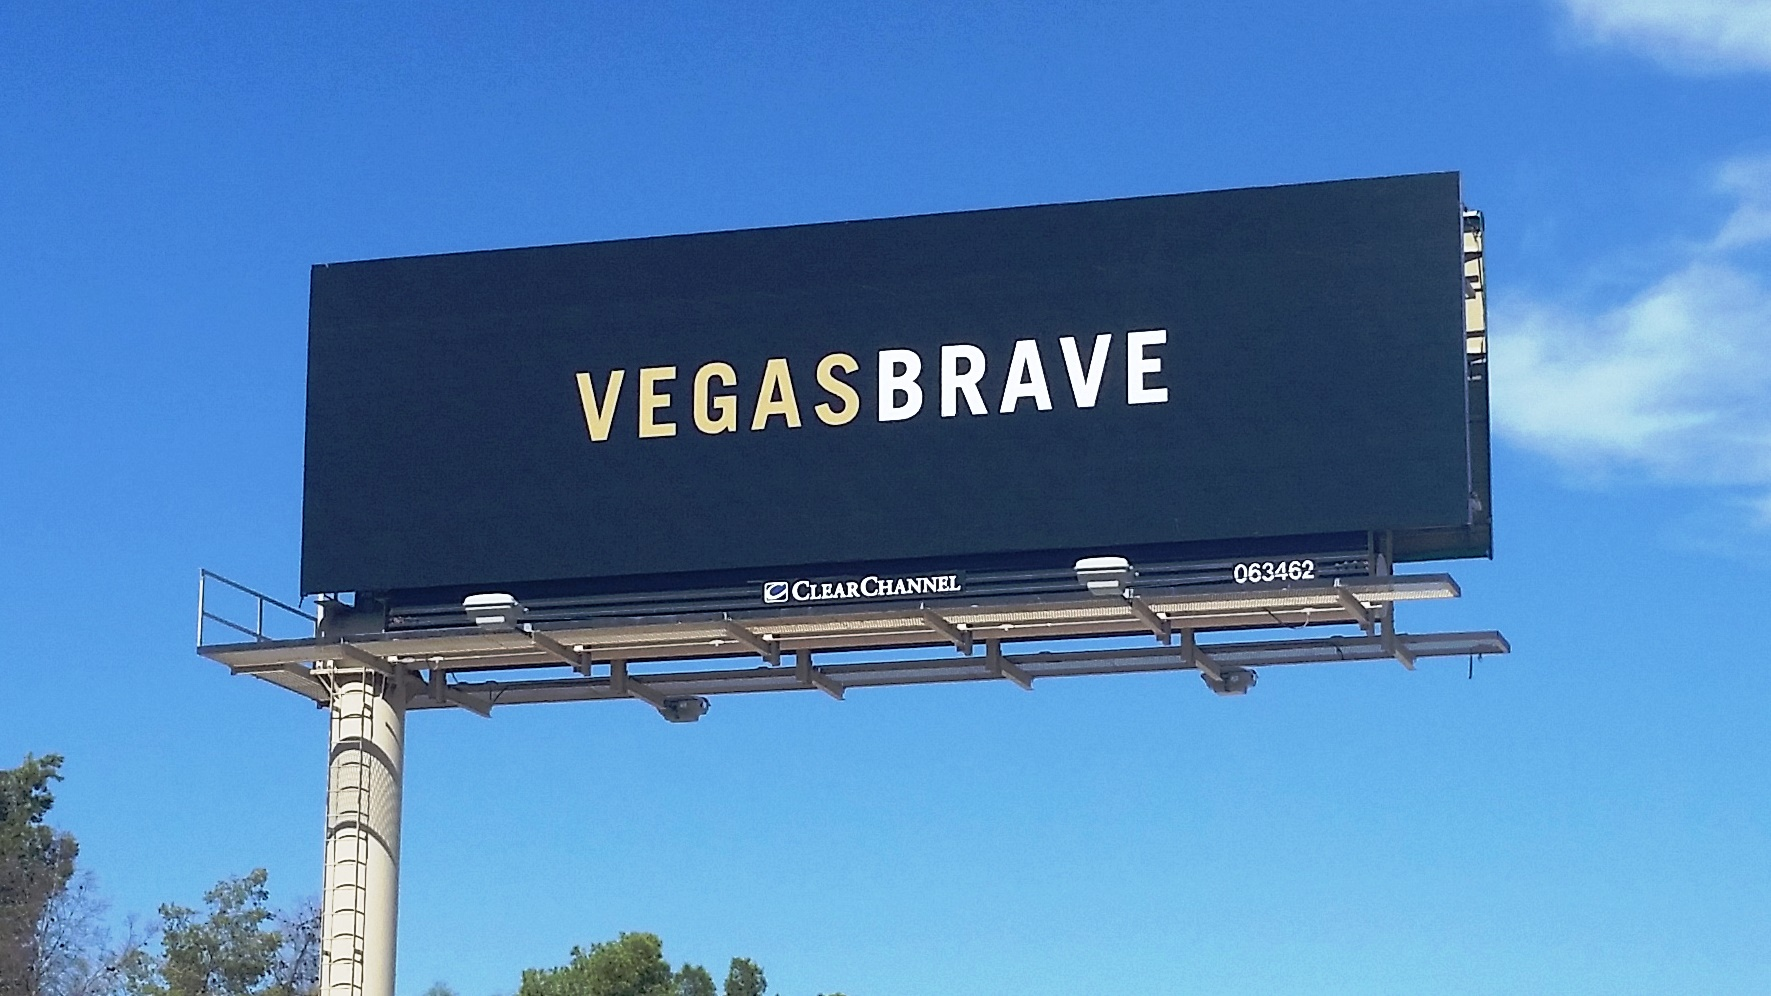 Vegas Brave